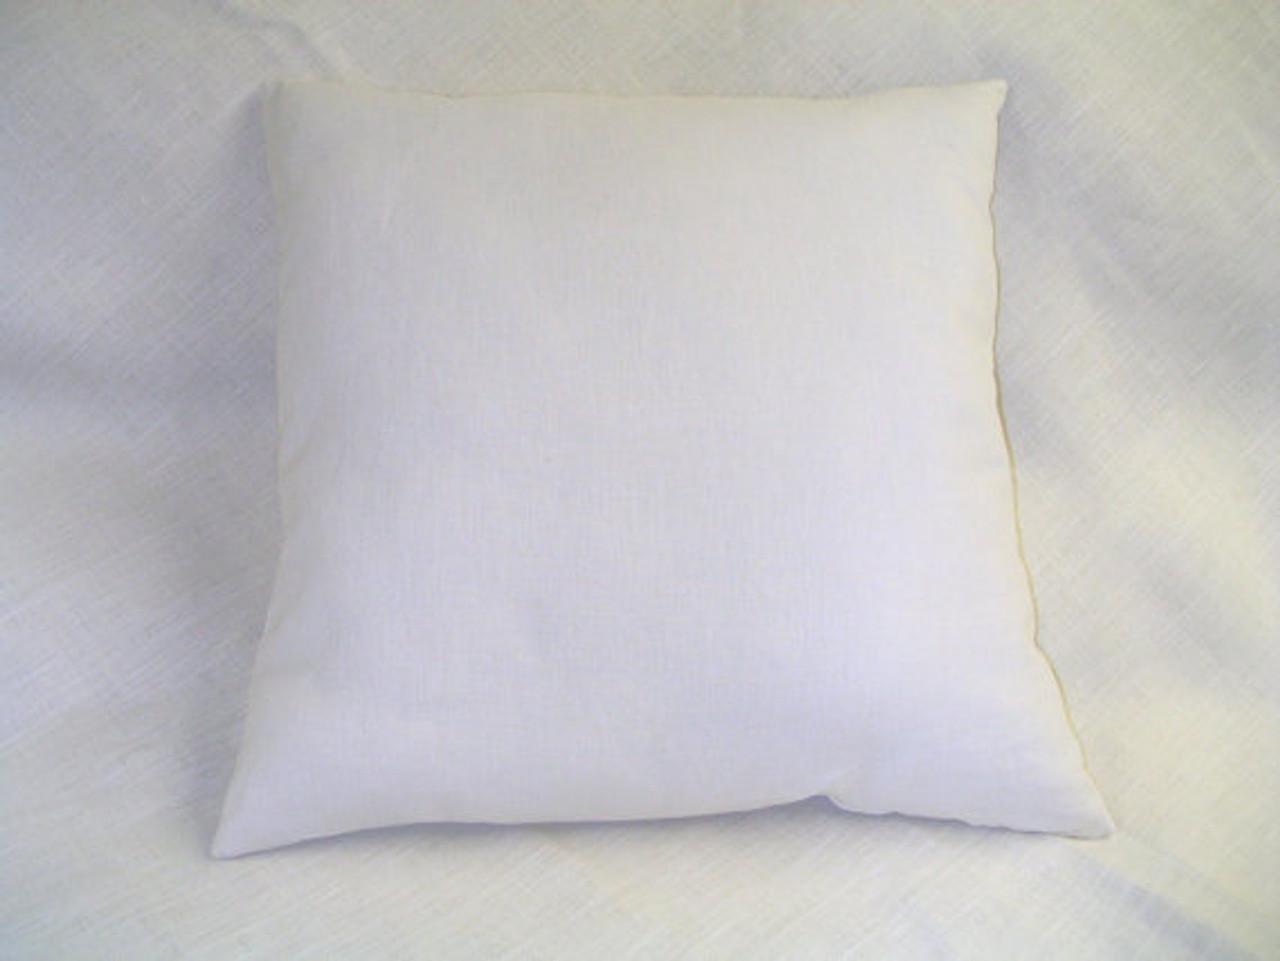 2 new organic throw pillows 16x16 handmade eco wool fill hemp cotton usa insert